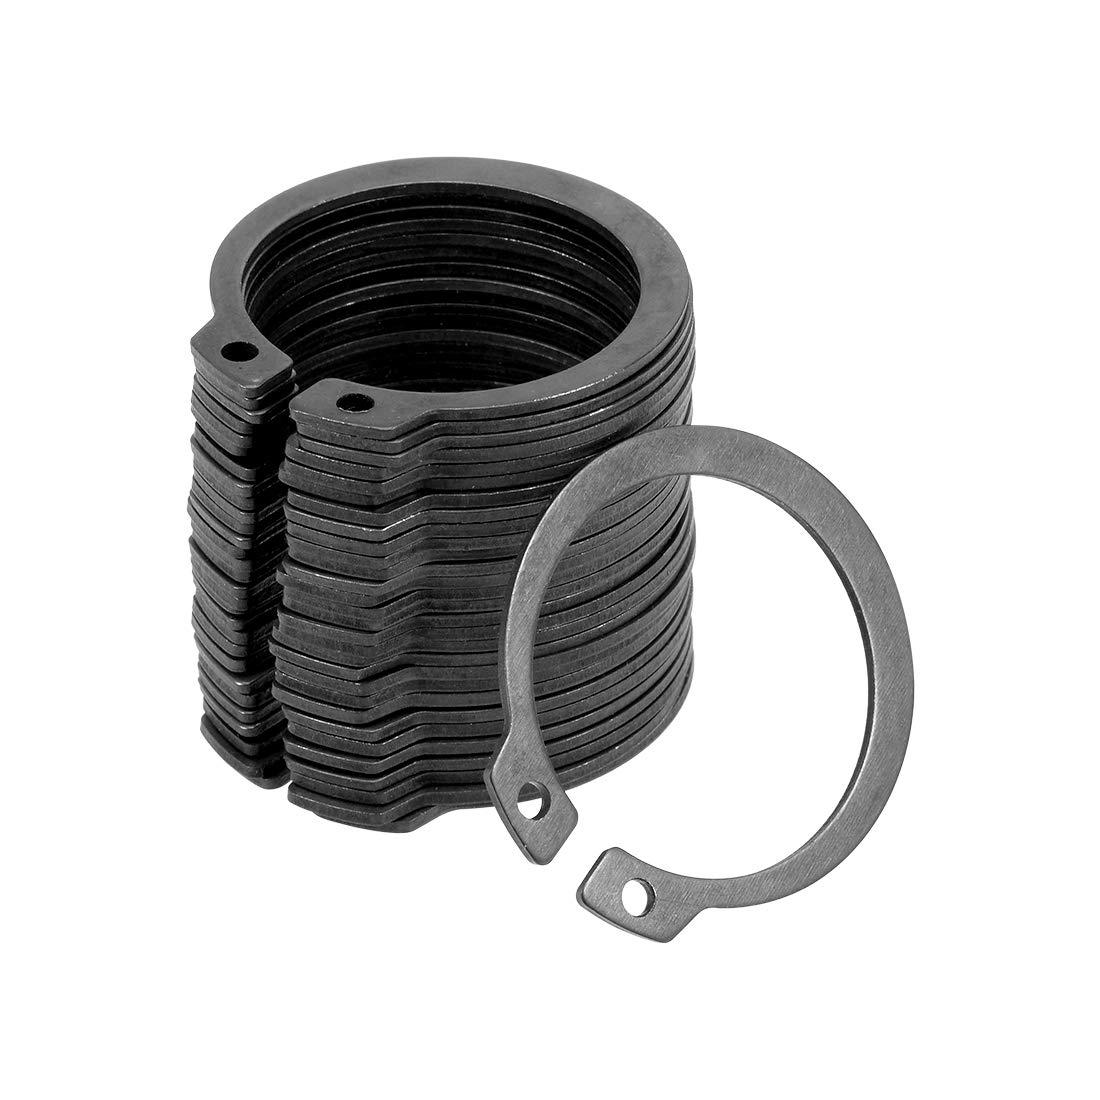 uxcell 35.5mm External Circlips C-Clip Retaining Snap Rings 65Mn 30pcs